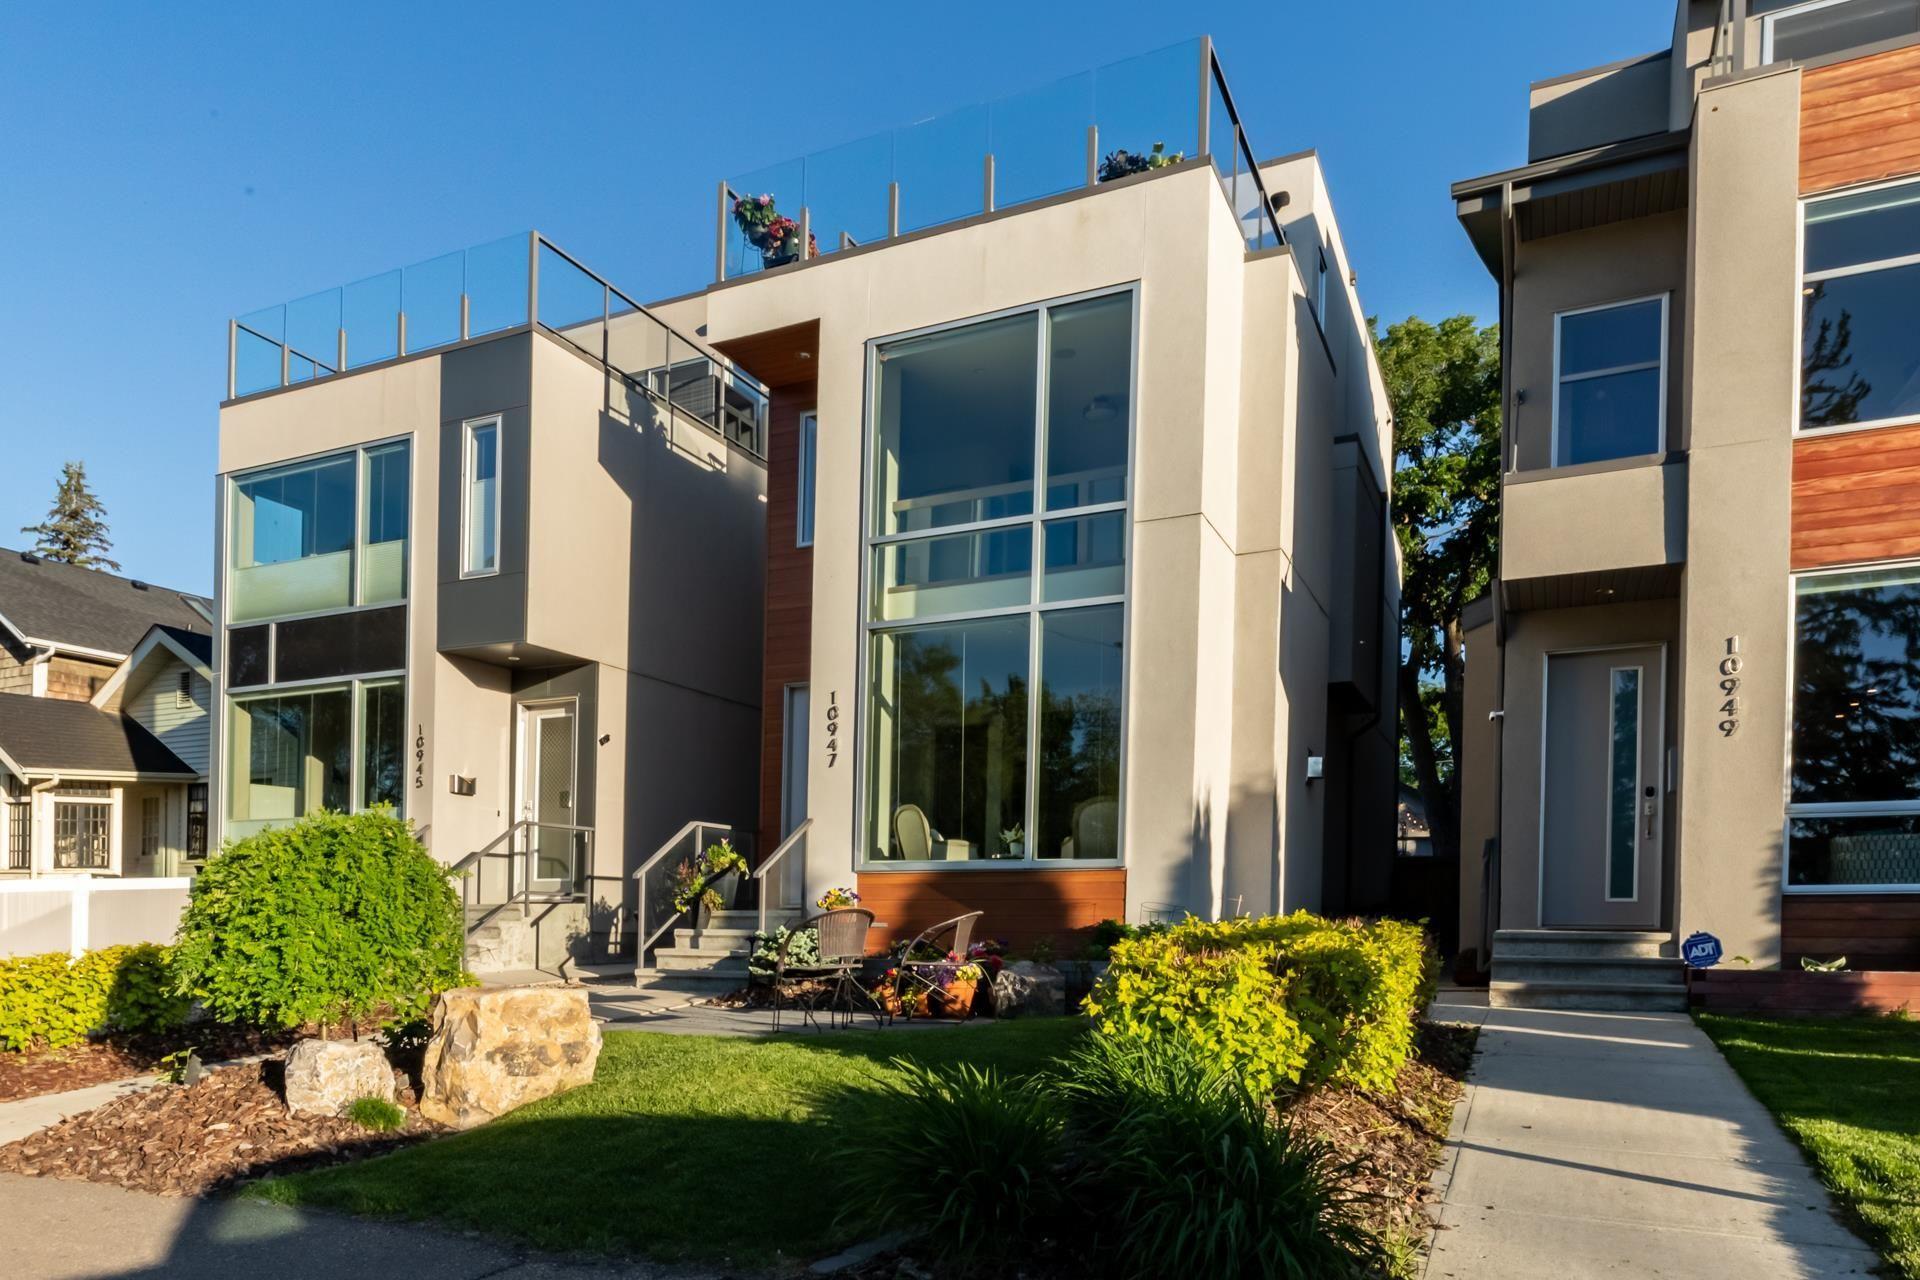 Main Photo: 10947 90 Avenue in Edmonton: Zone 15 House for sale : MLS®# E4249148